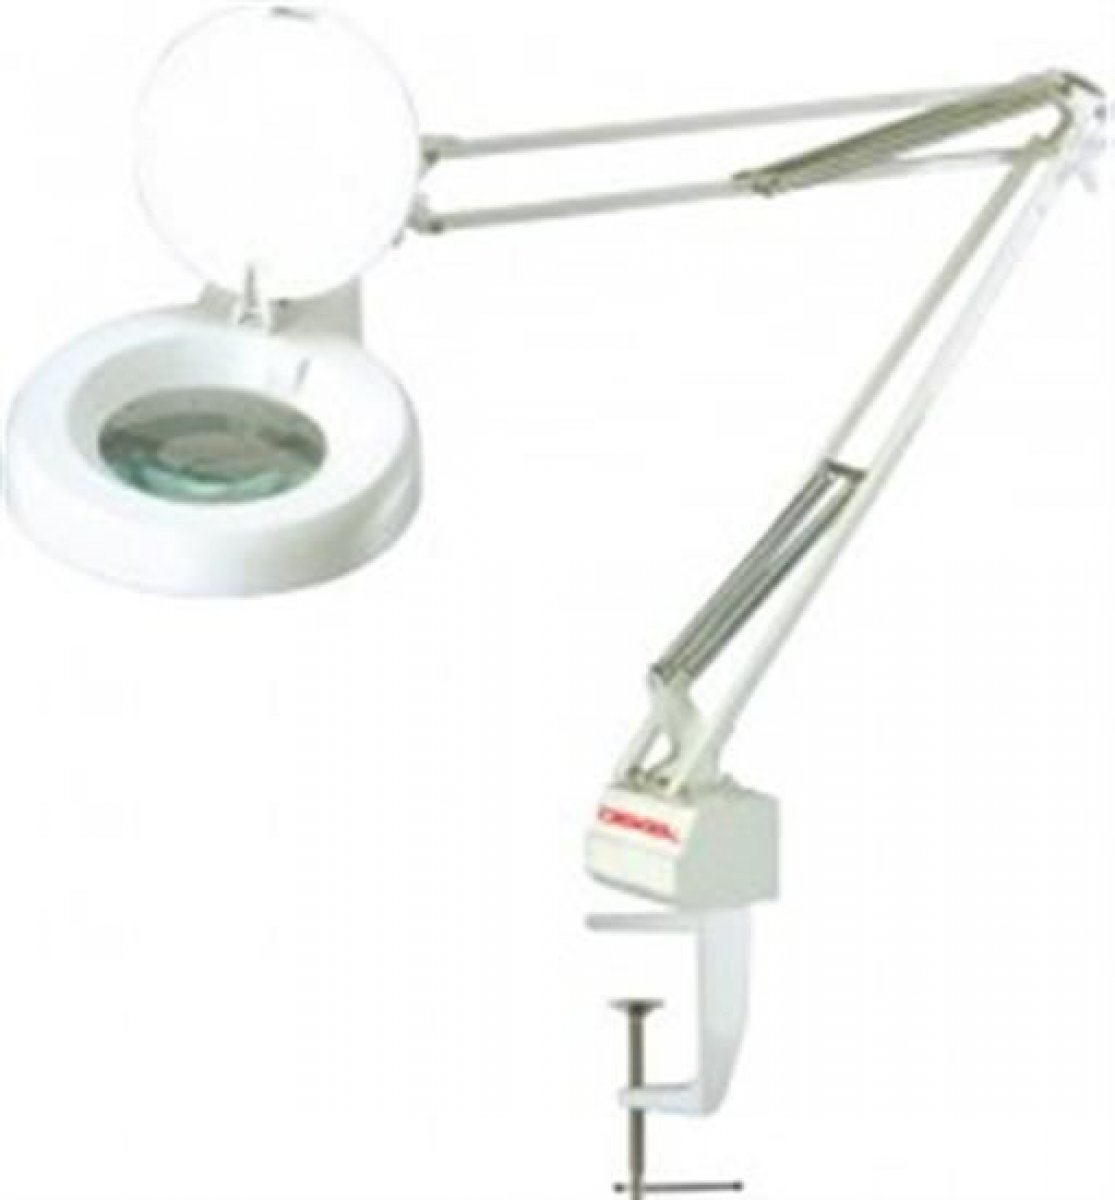 Lupa de bancada c/ iluminação 5x 22watts 110v tl1020 dekel